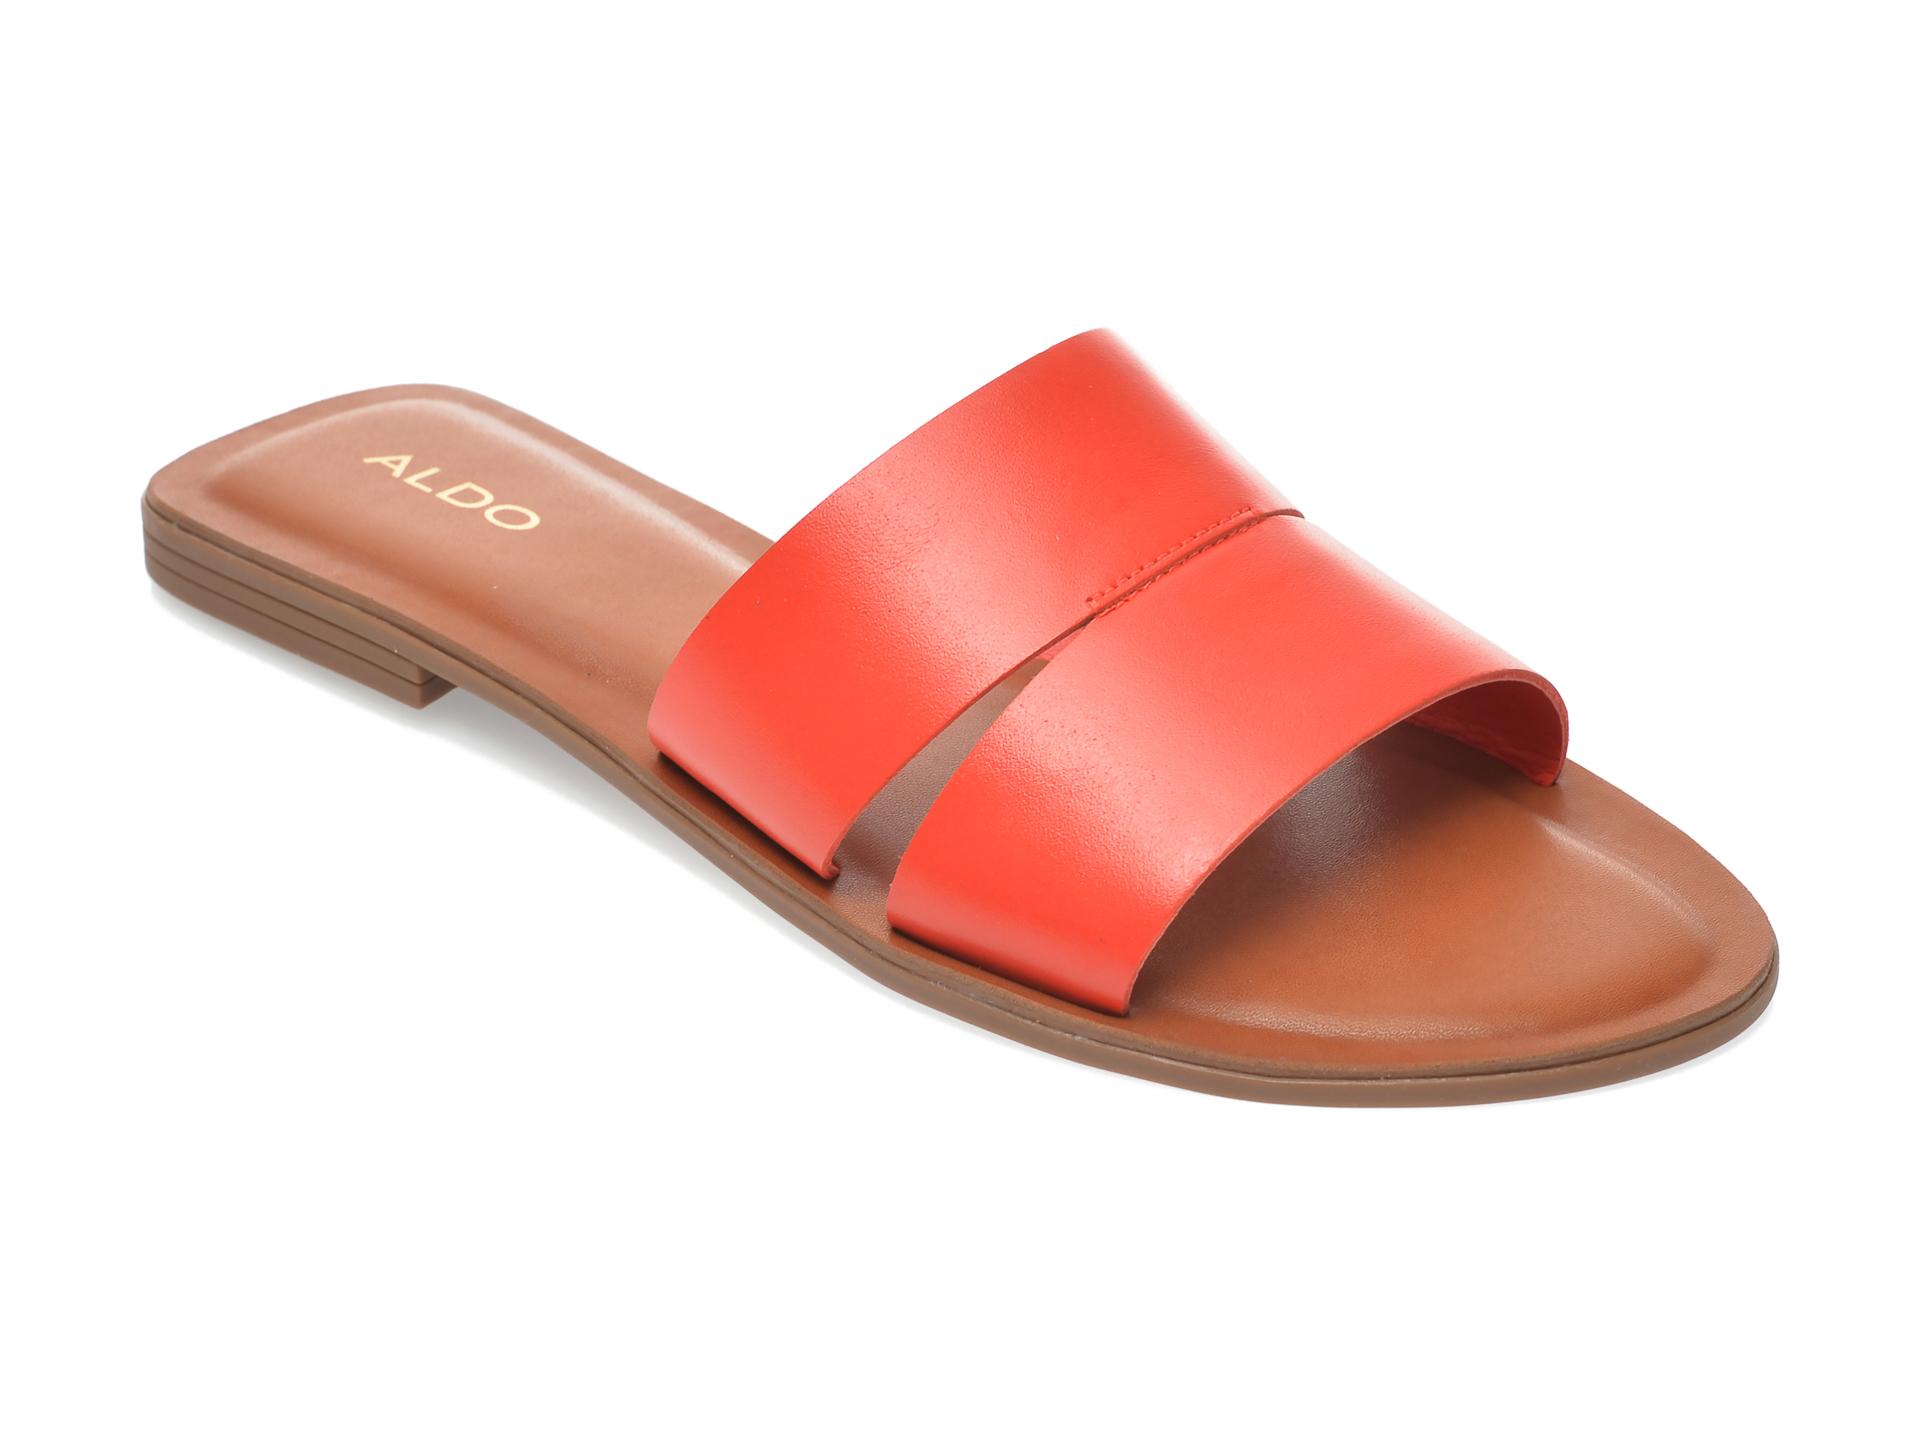 Papuci ALDO rosii, Andonia600, din piele naturala New